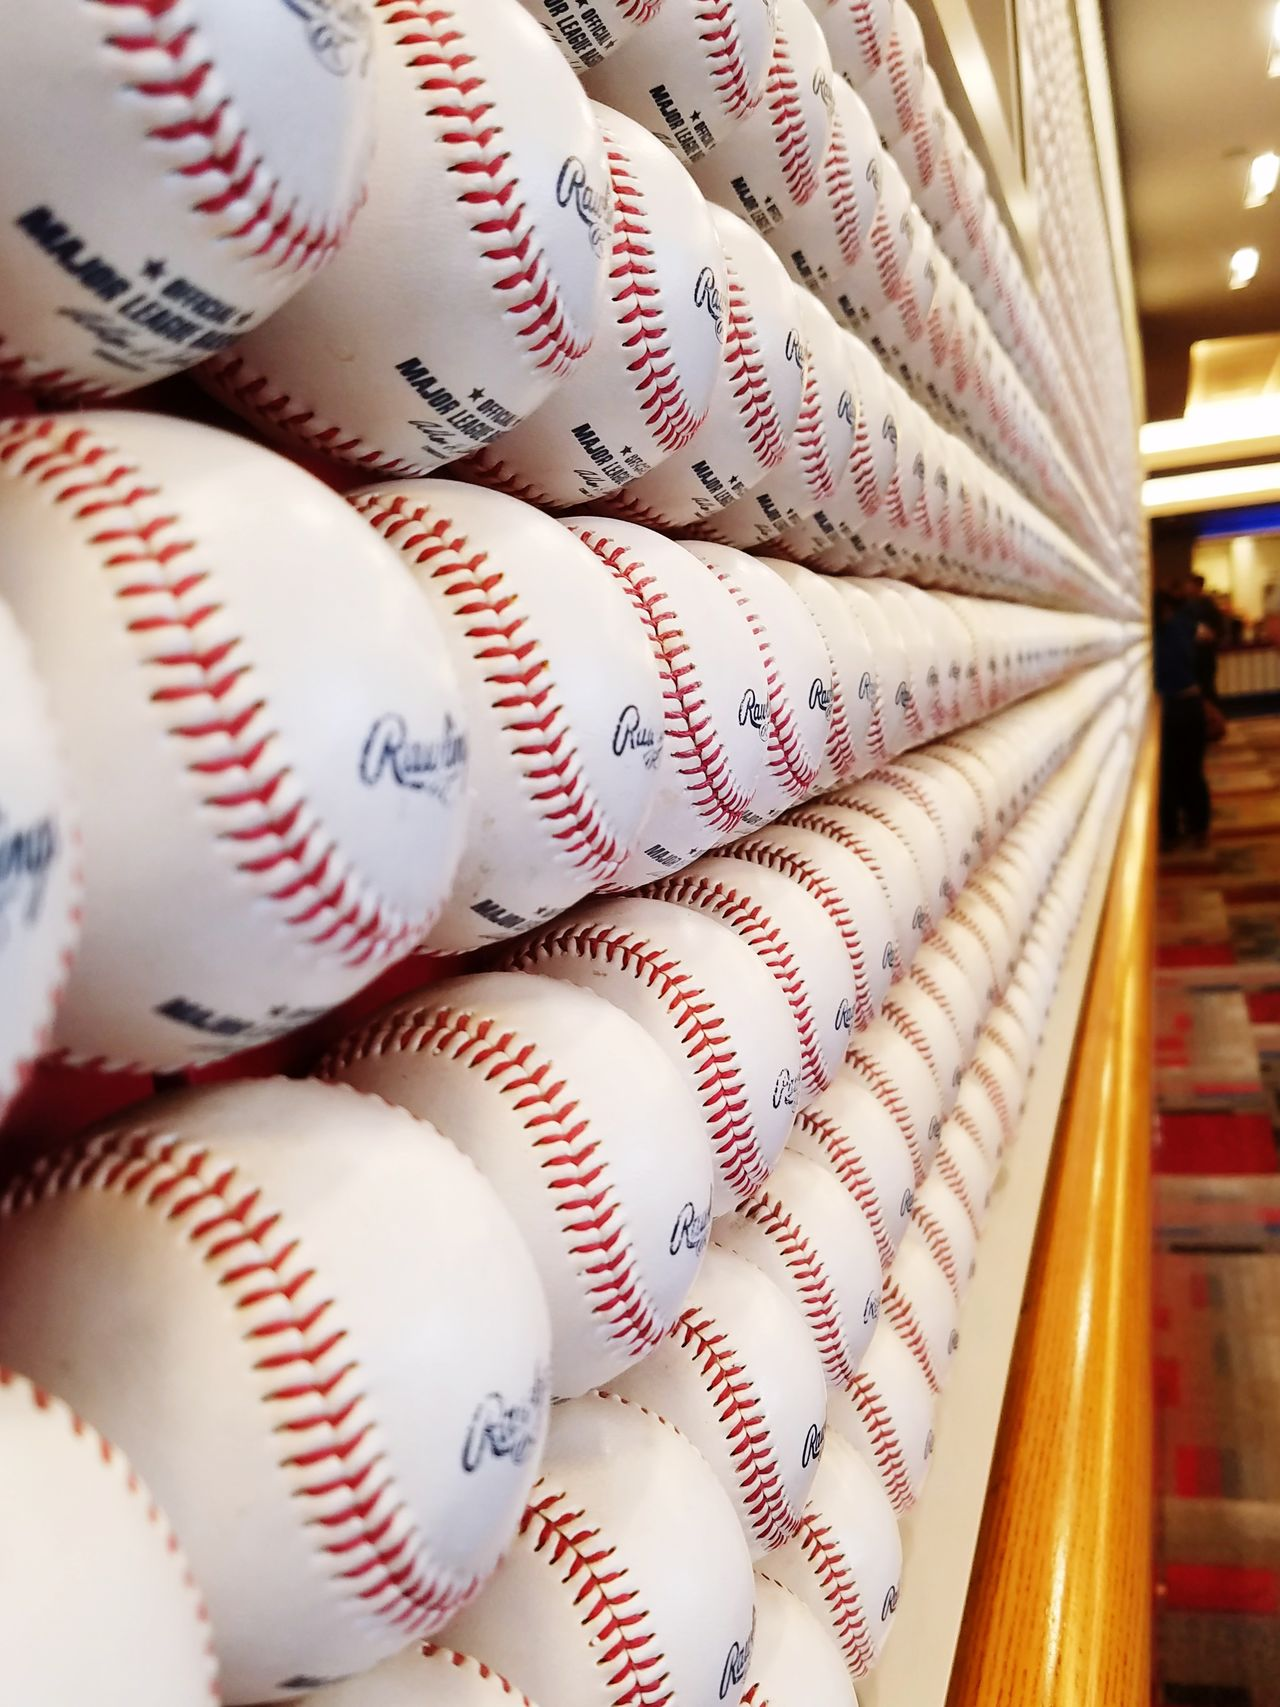 Indoors  No People Baseball Baseballs Wall Of Baseballs Hall Of Fame So Many Balls America's Favorite Pastime Sport Sports Beerfest